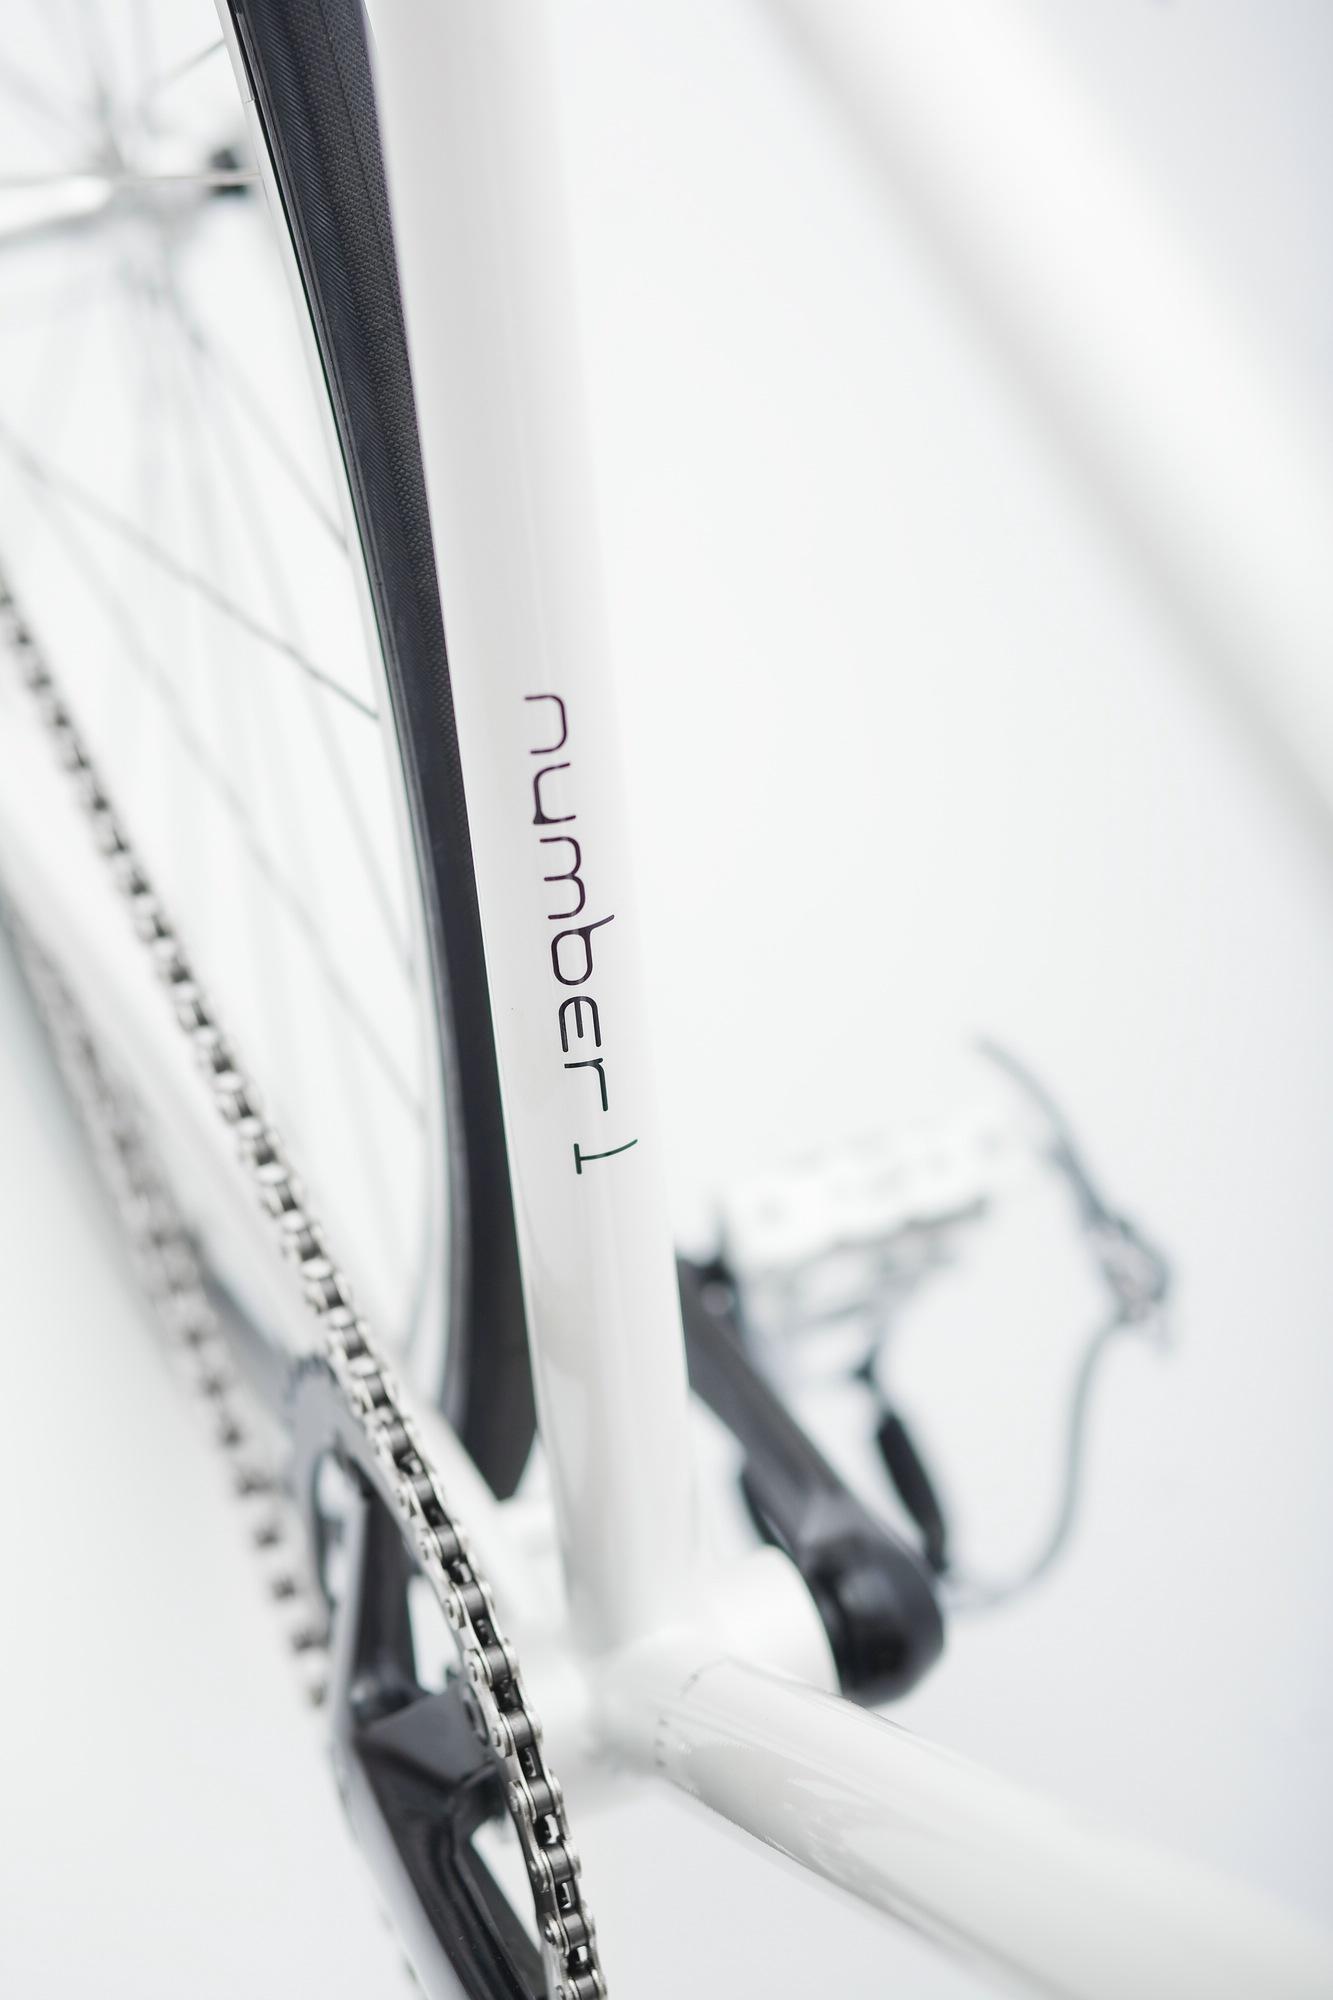 Single Speed Bike indy white, Unikate